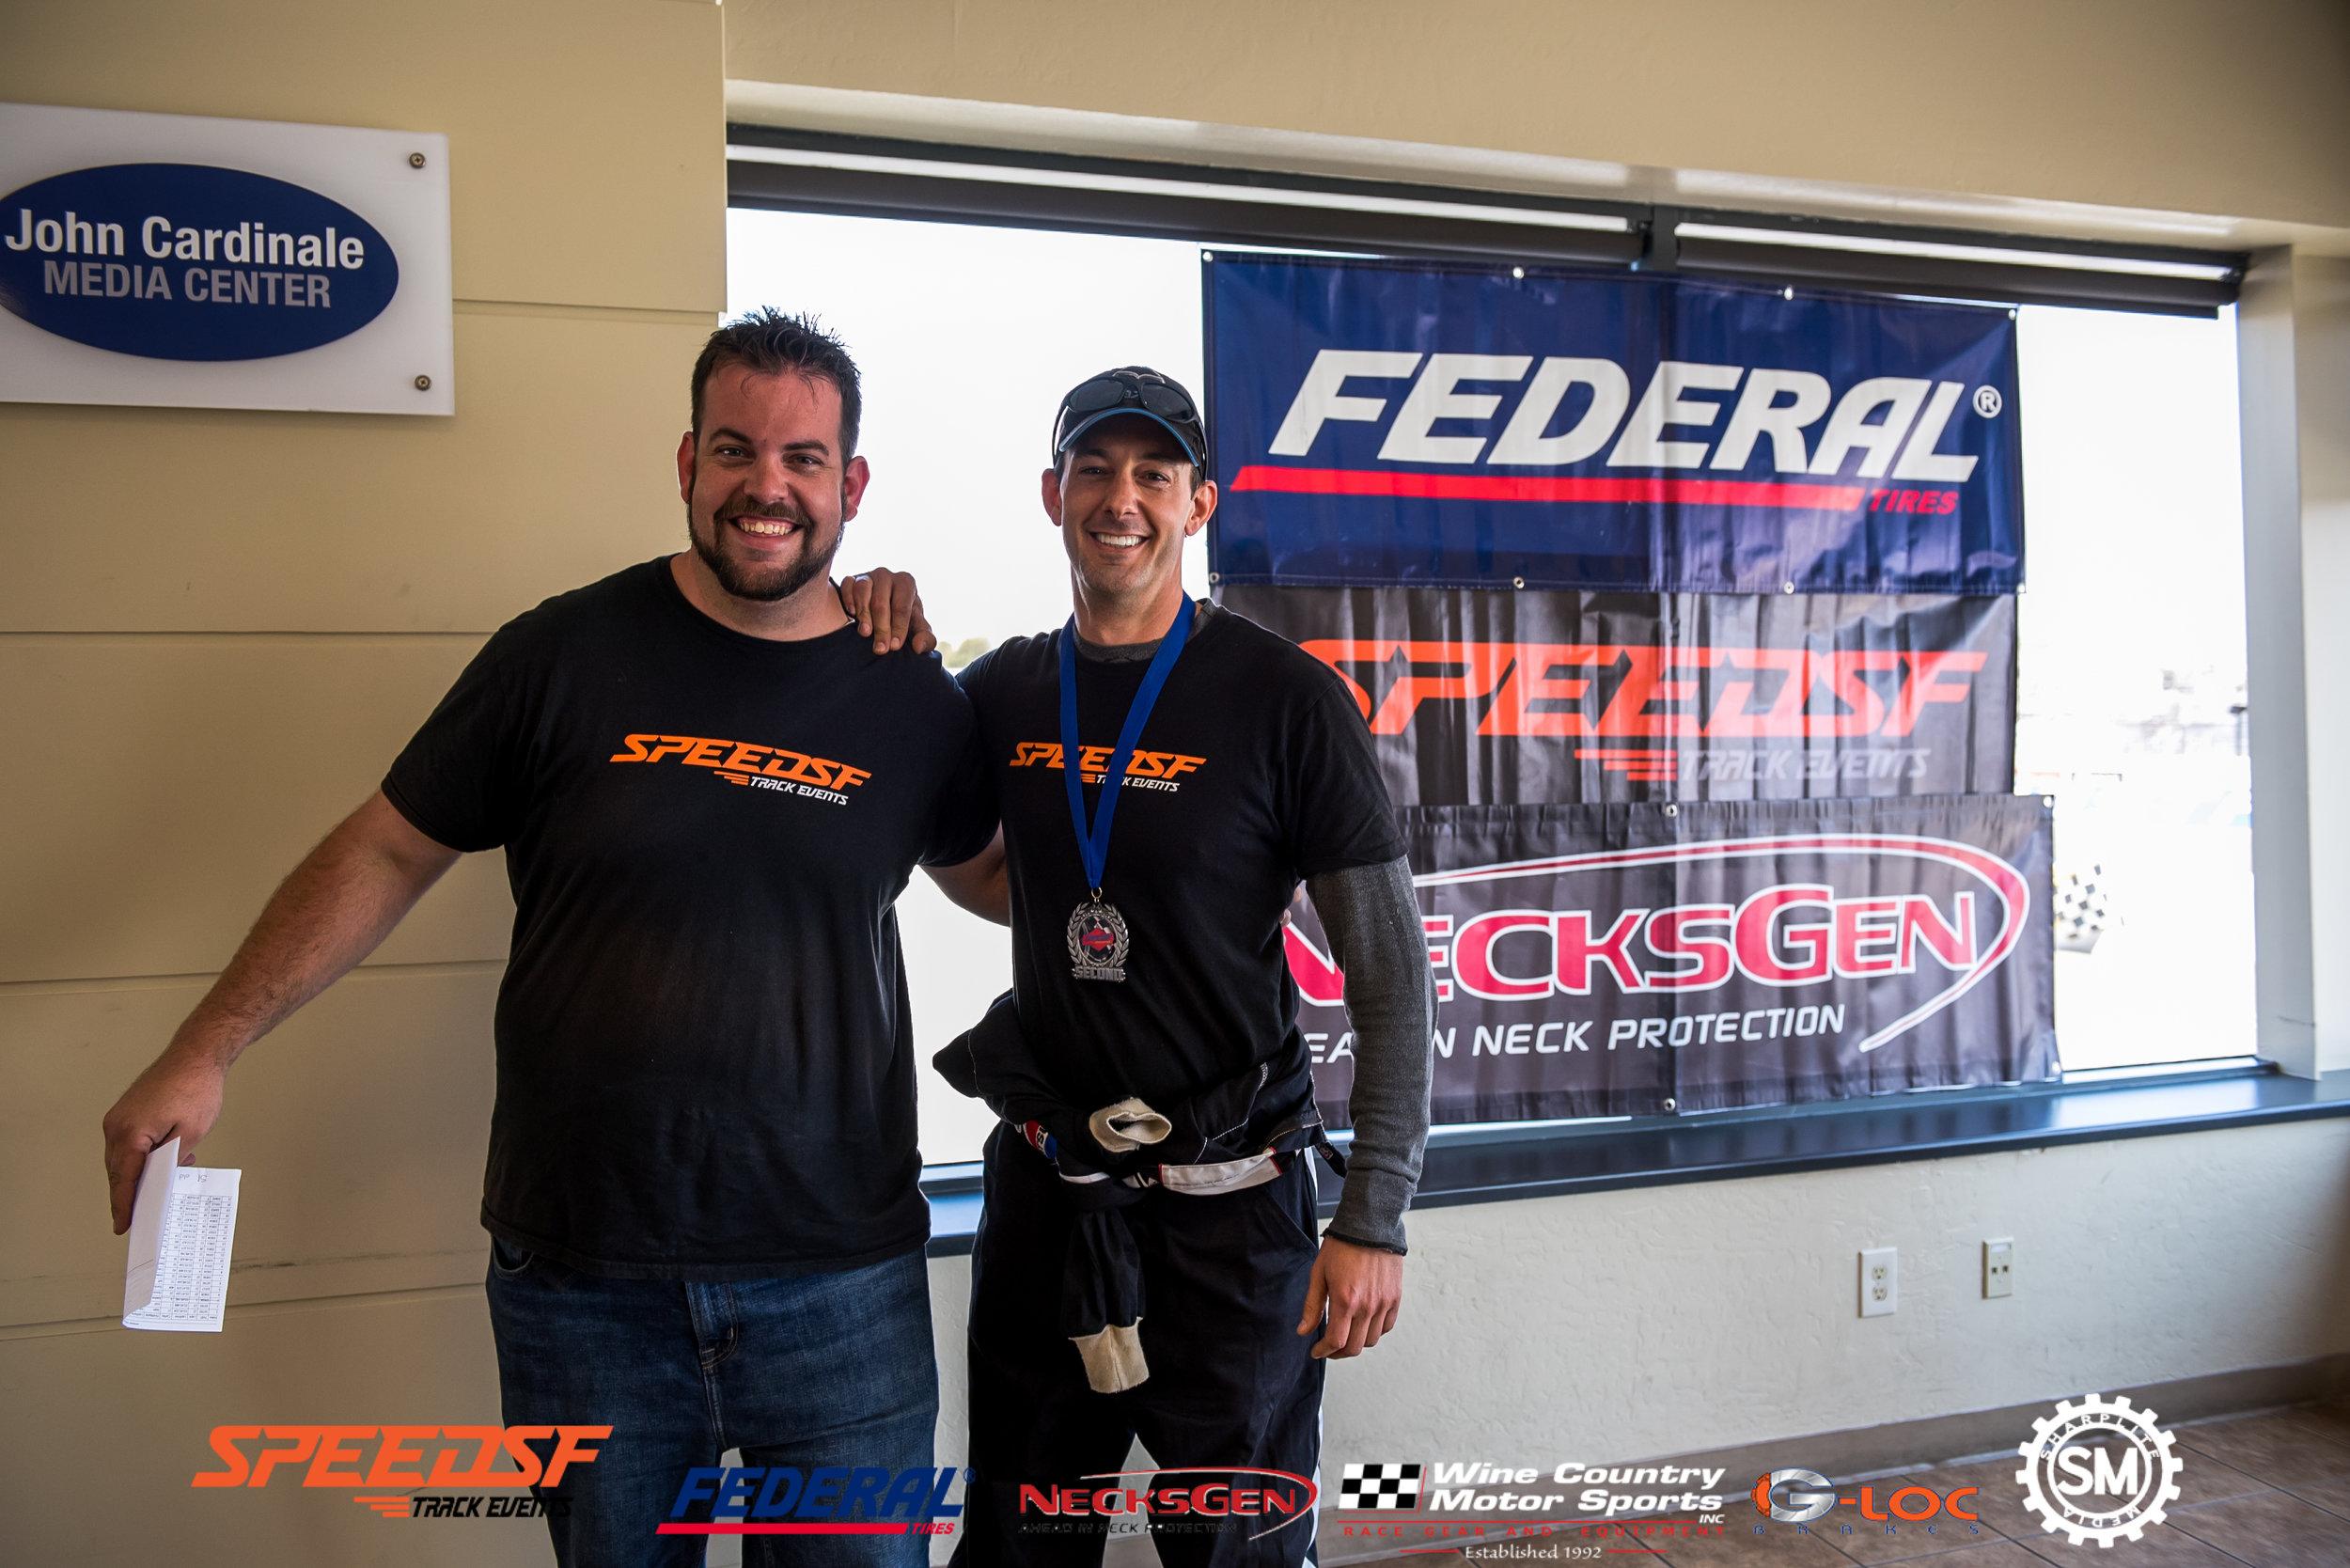 Sonoma Raceway_Monday_SpeedSF_PADDOCK-32.jpg